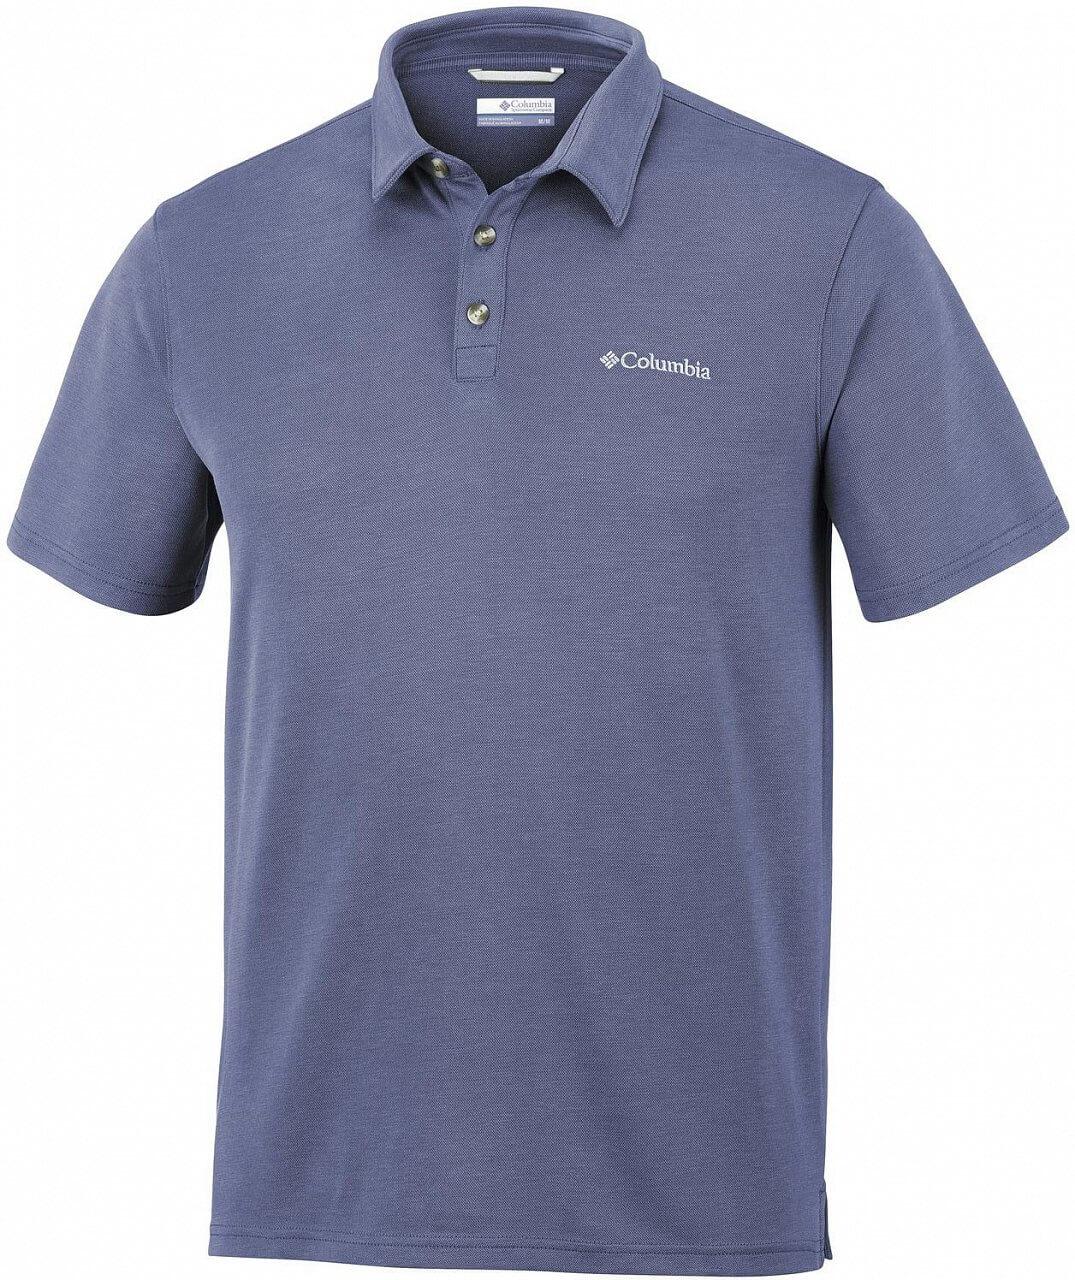 Pánské tričko Columbia Bromines Way Polo